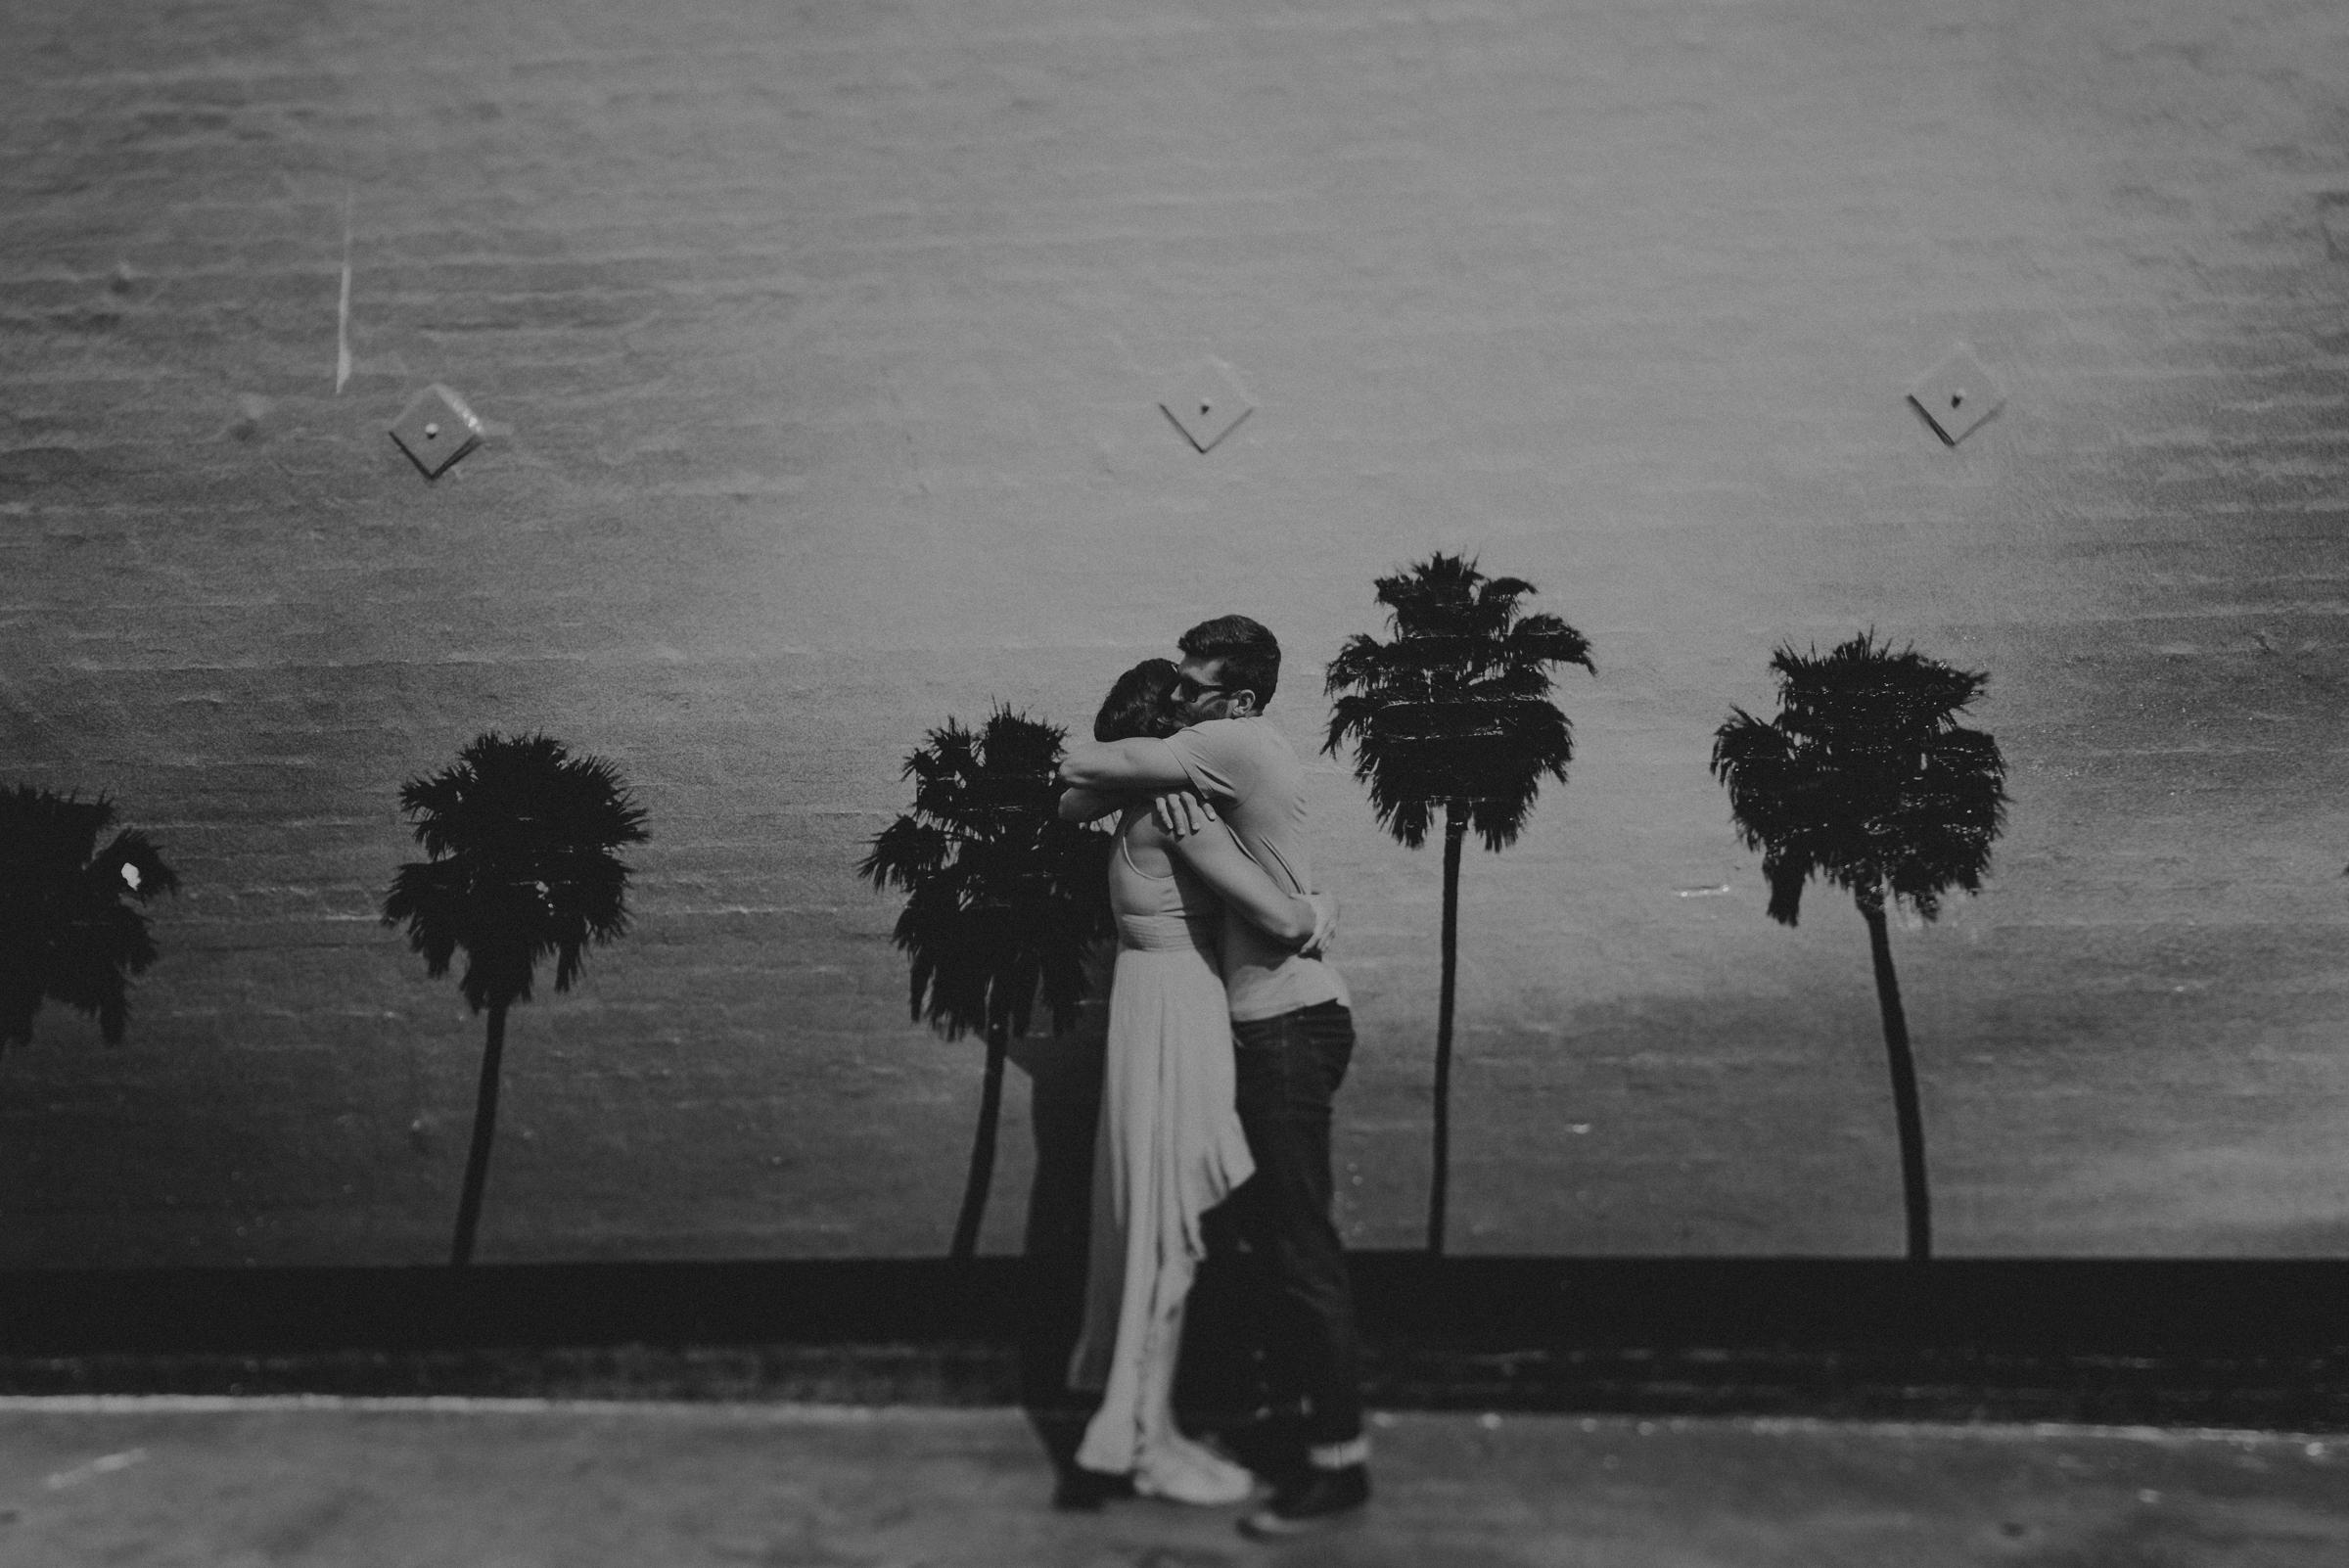 Isaiah + Taylor Photography - Venice Beach & Santa Monica Engagement Session, Los Angeles Wedding Photographer-030.jpg